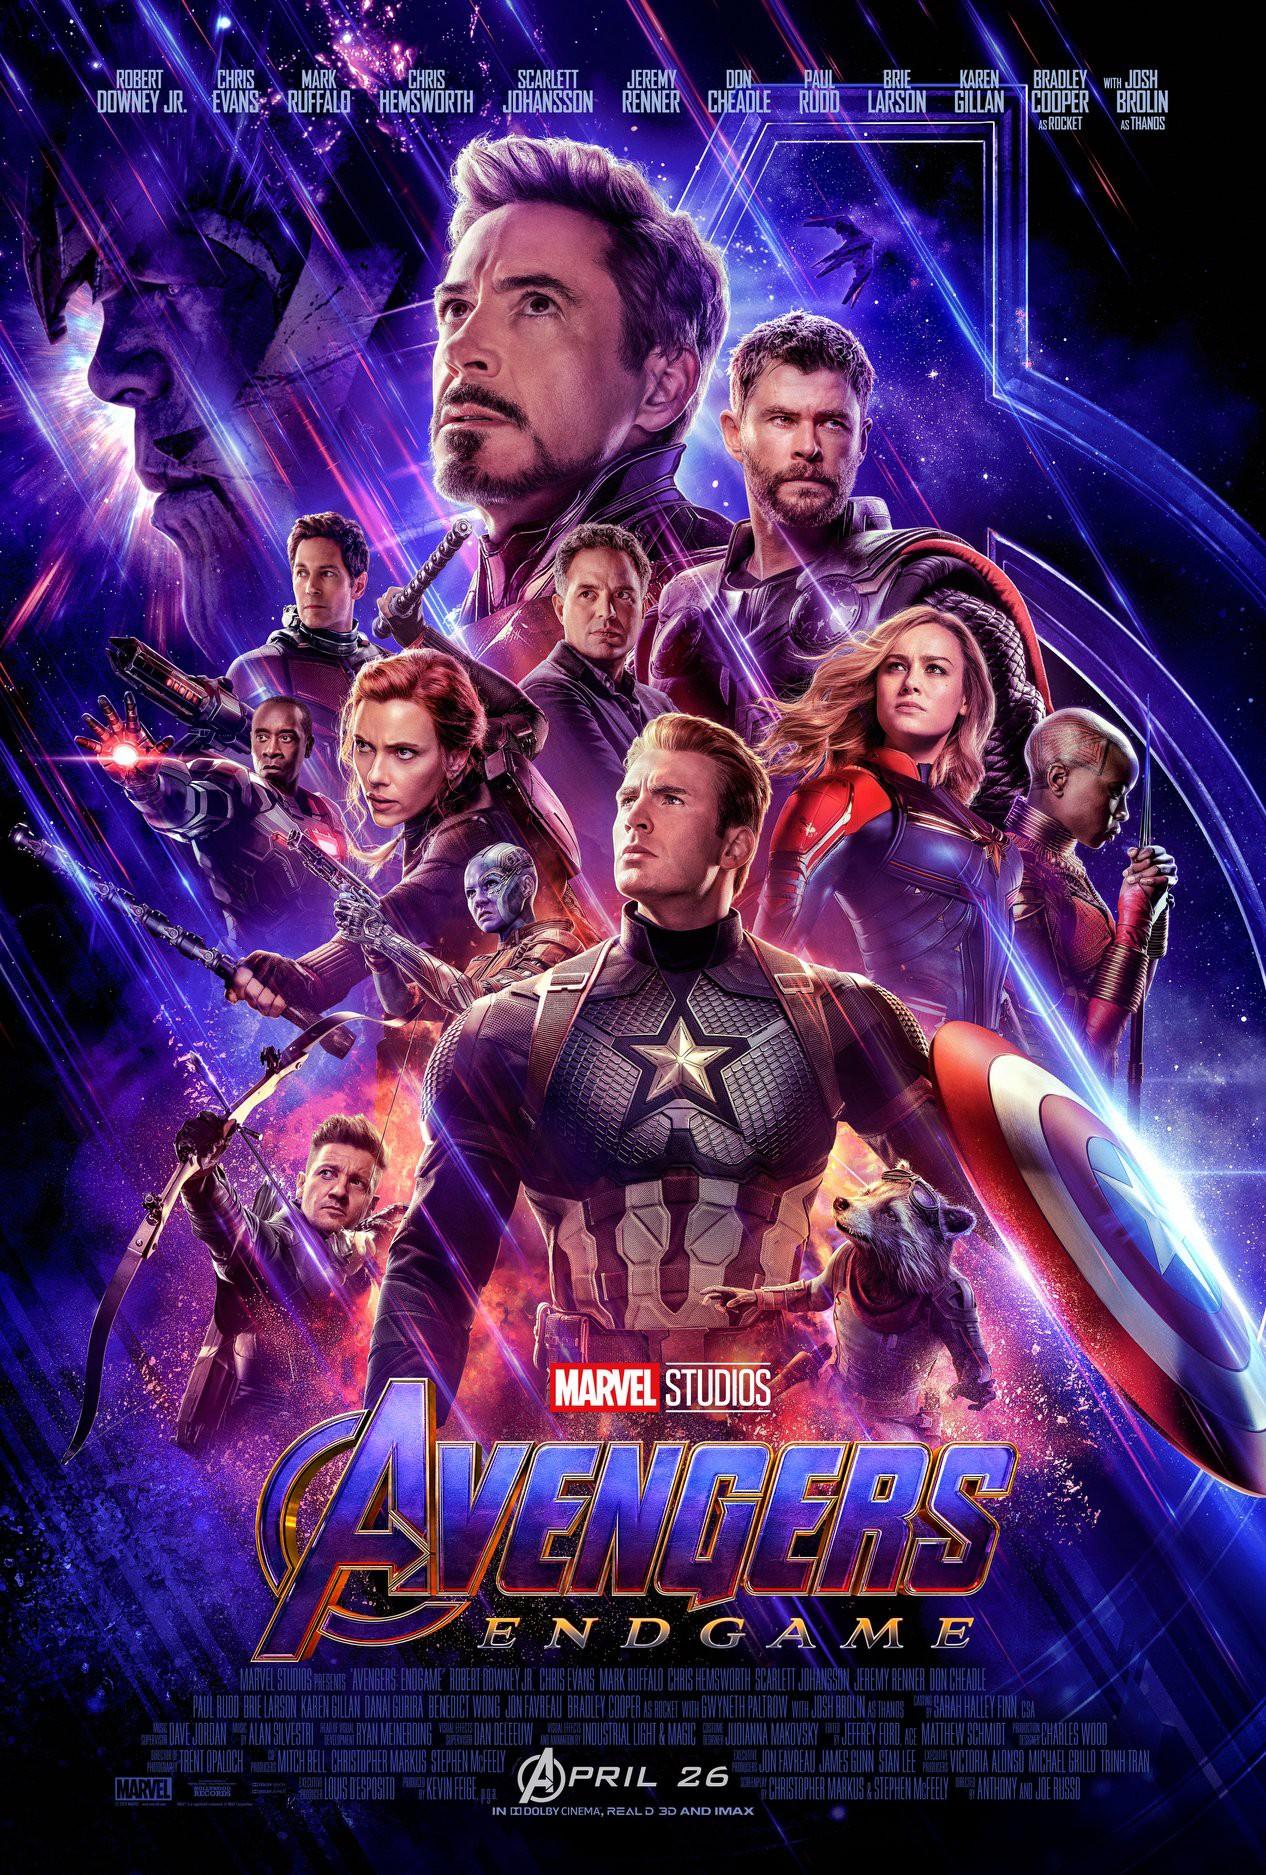 AvengersEndgame5c8a4f1ce3ff5.jpg